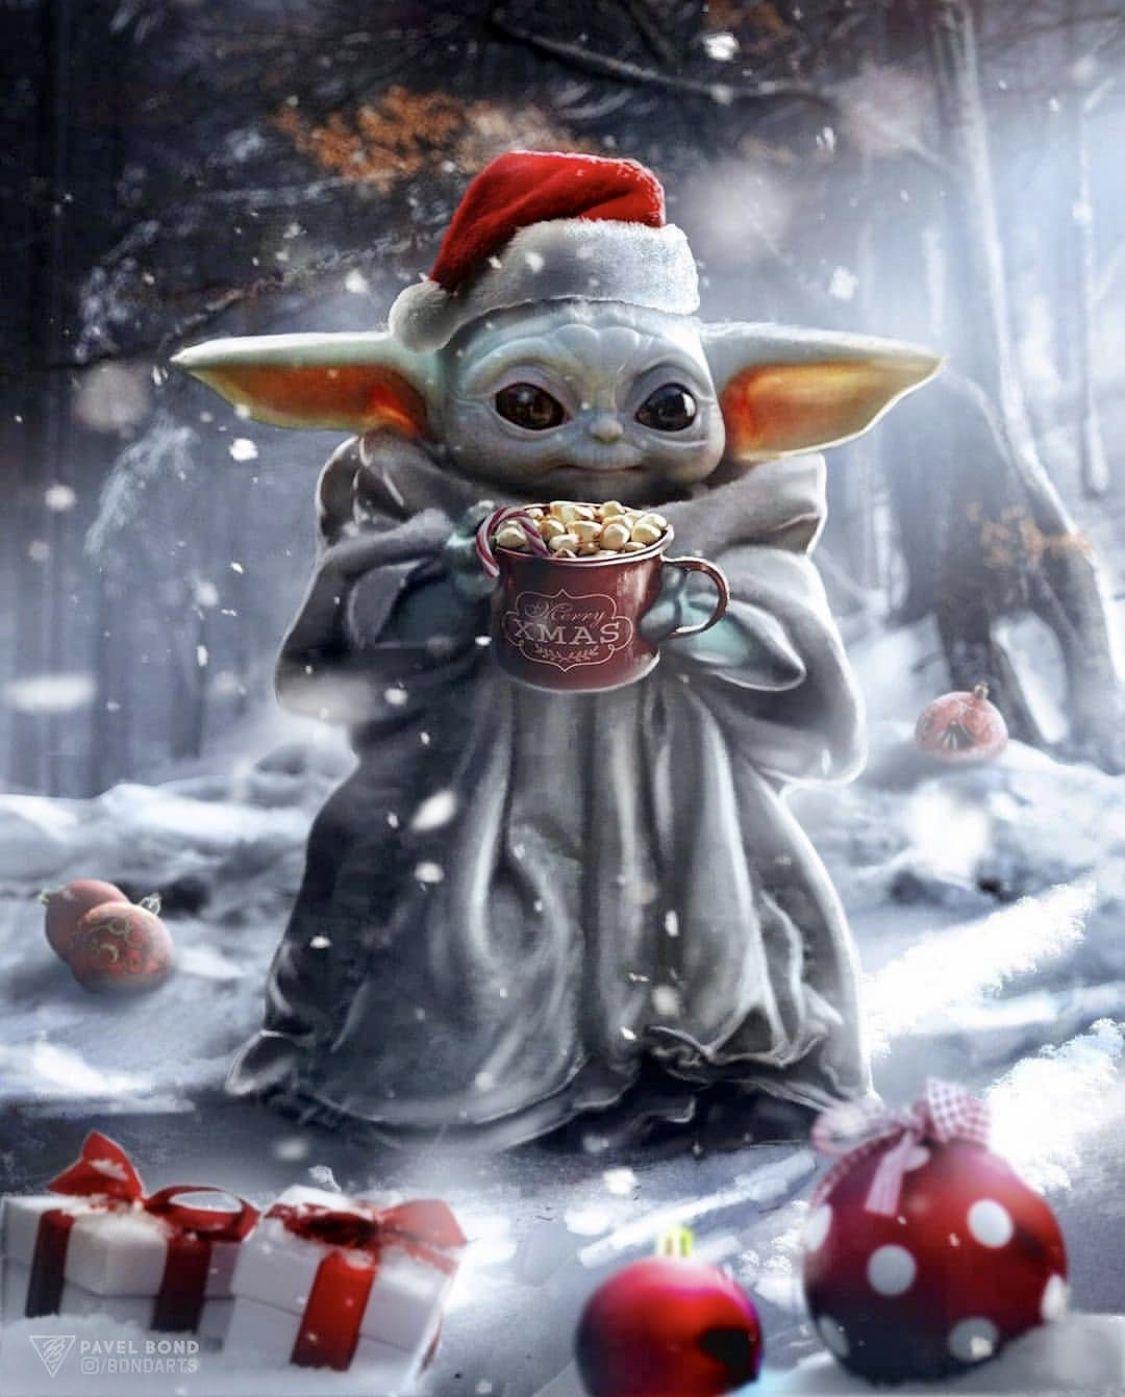 Baby Yoda Christmas Wallpapers Top Free Baby Yoda Christmas Backgrounds Wallpaperaccess